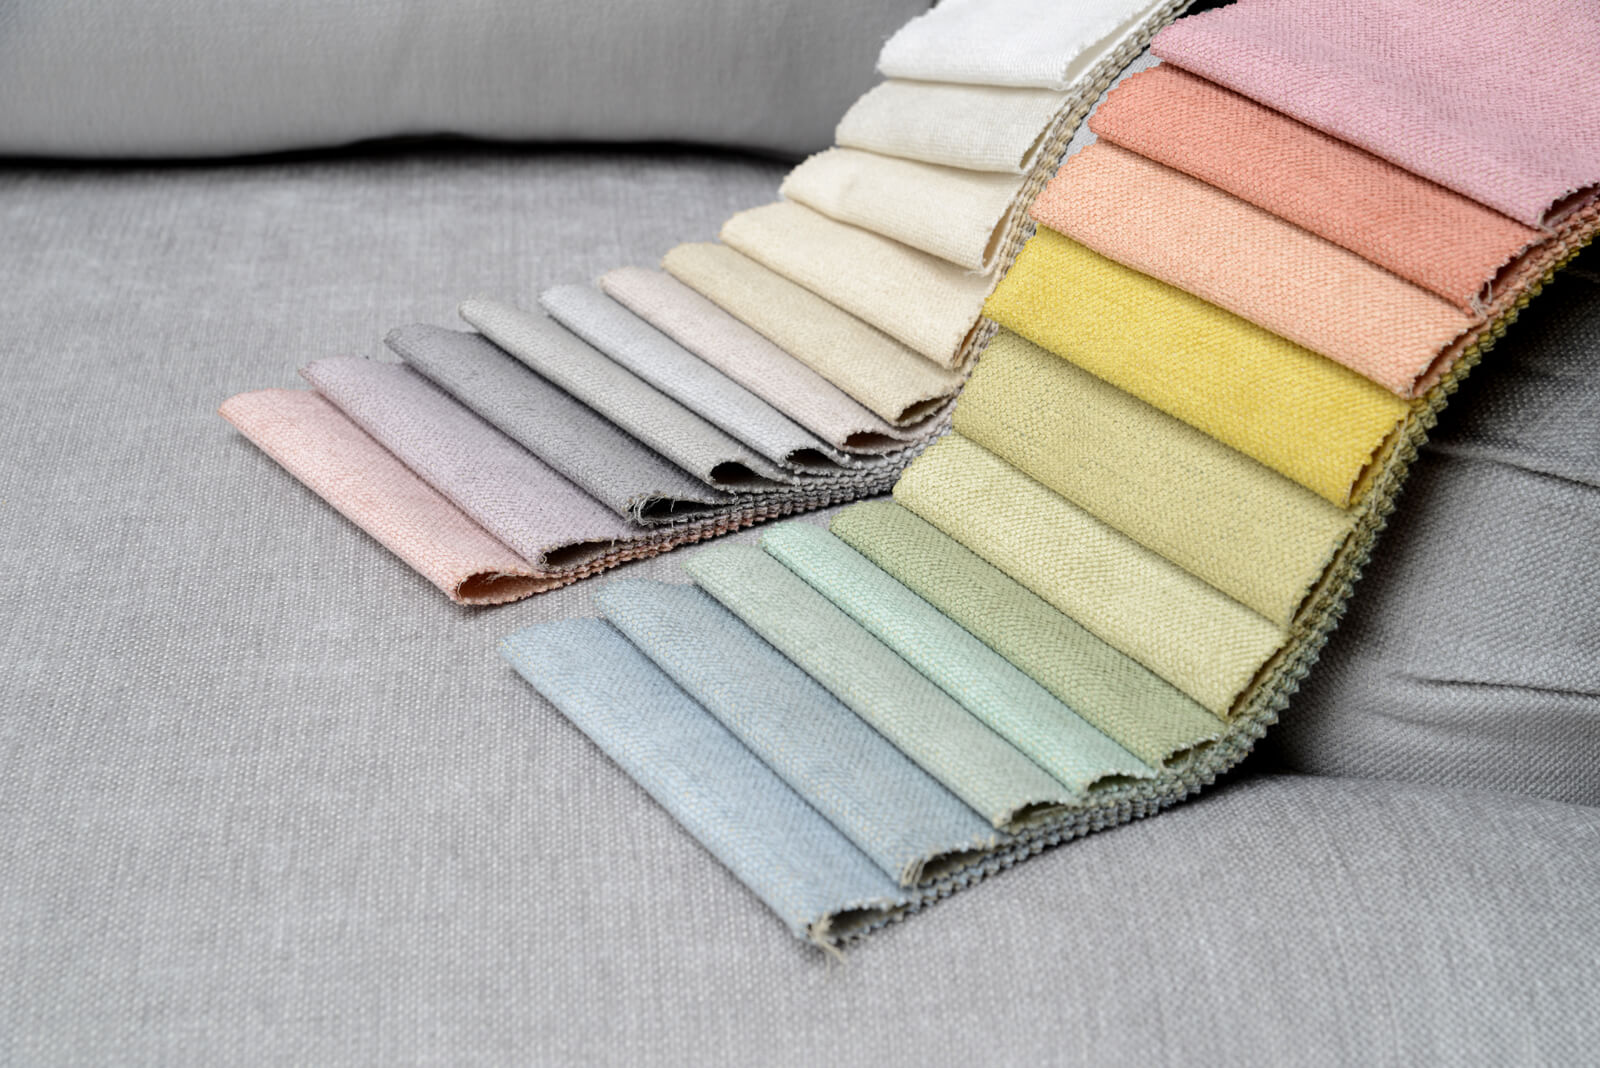 Sofa_Pastelltoene-Stoffe